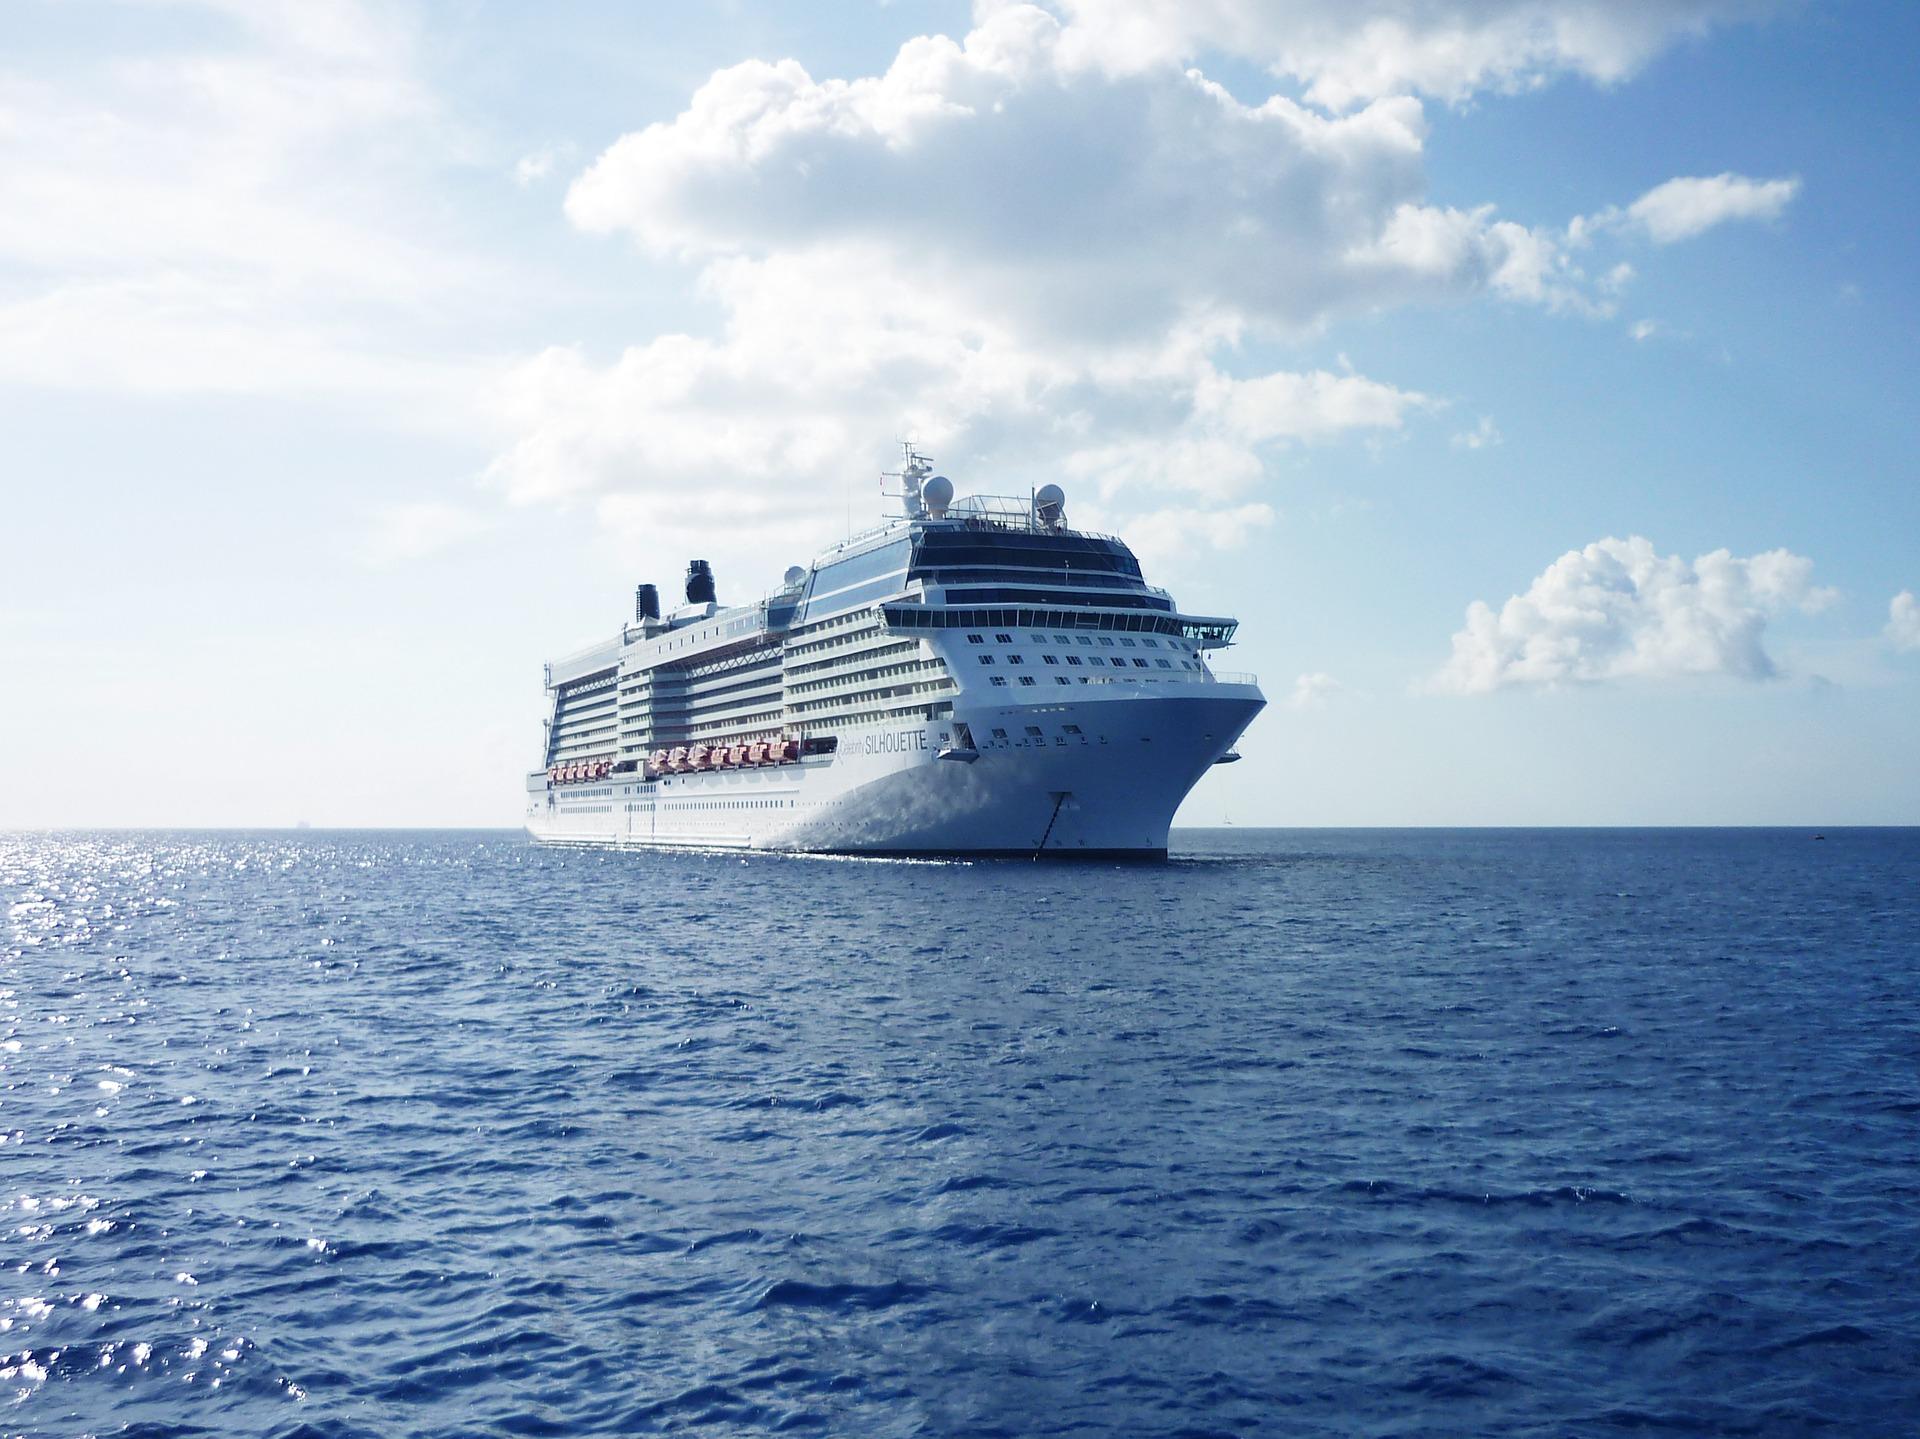 Royal Caribbean cerca apprendista